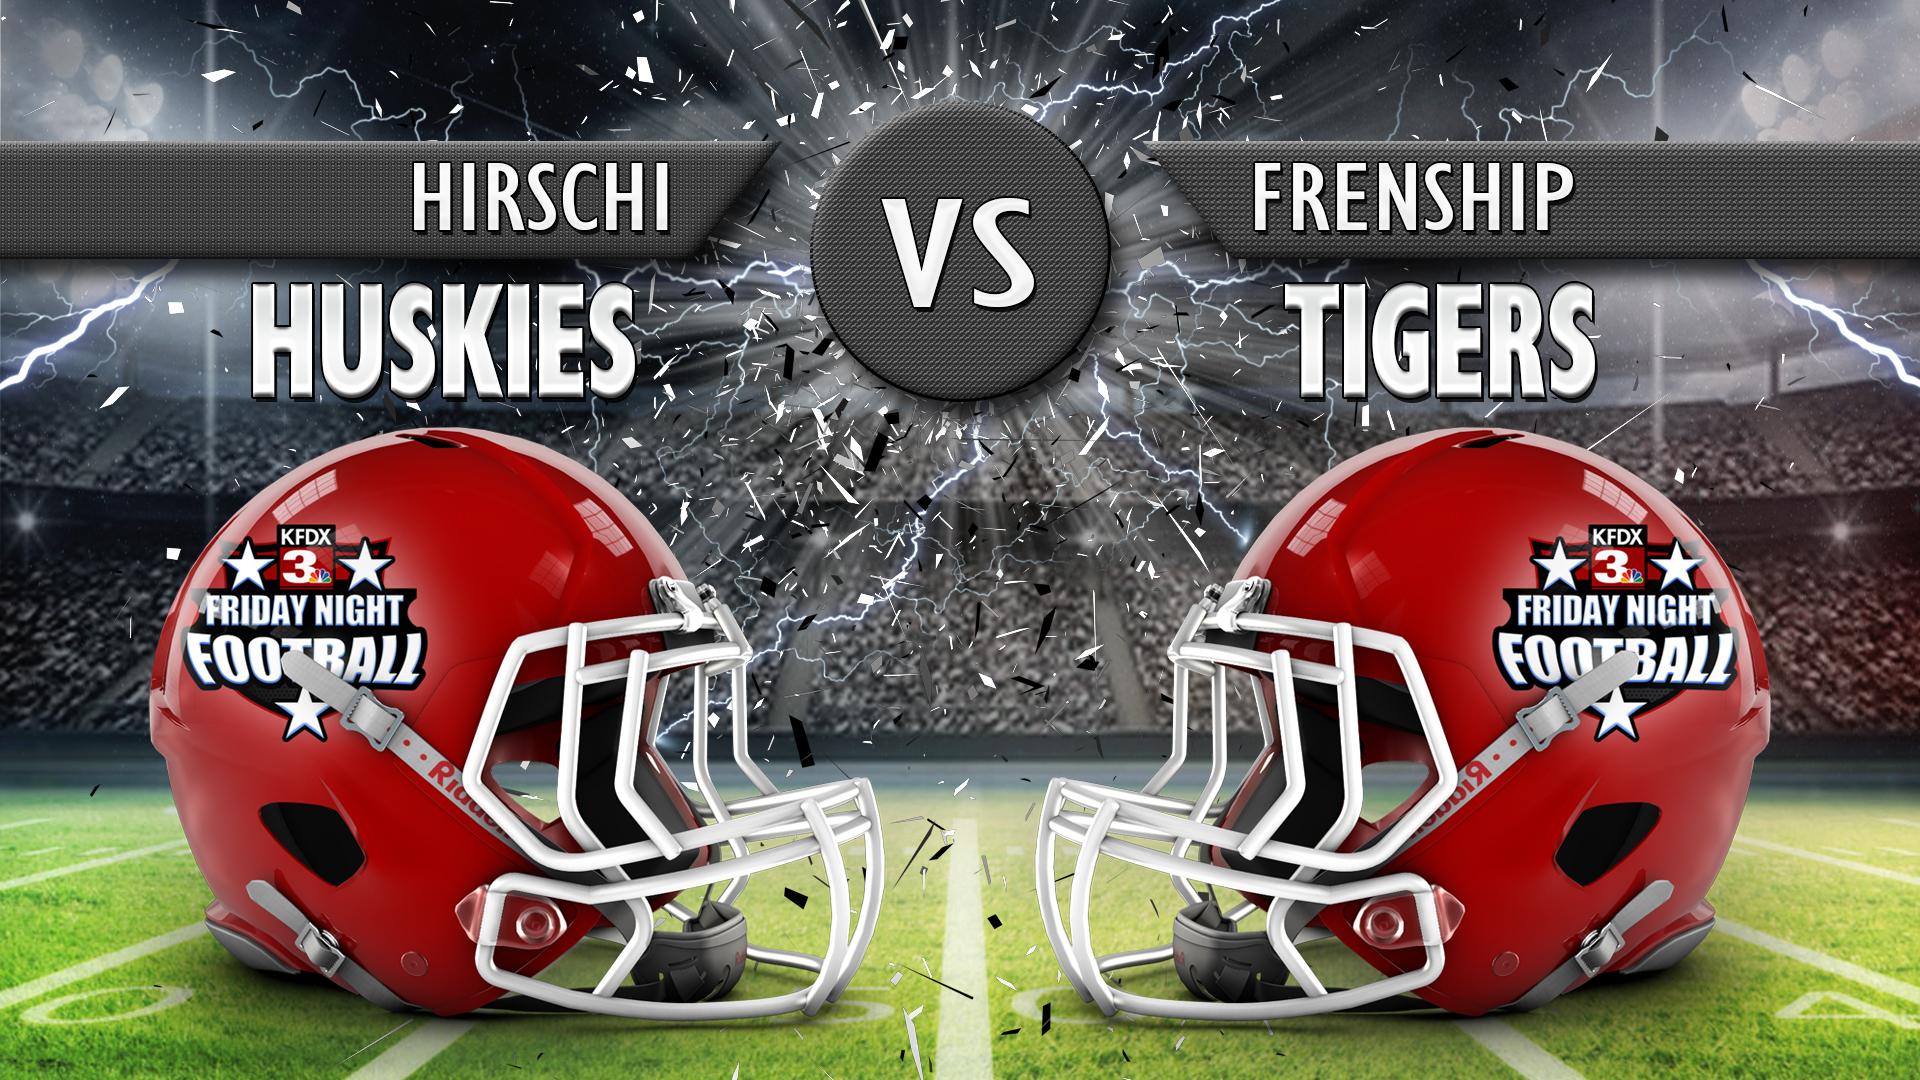 HIRSCHI VS FRENSHIP_1536336663625.jpg.jpg